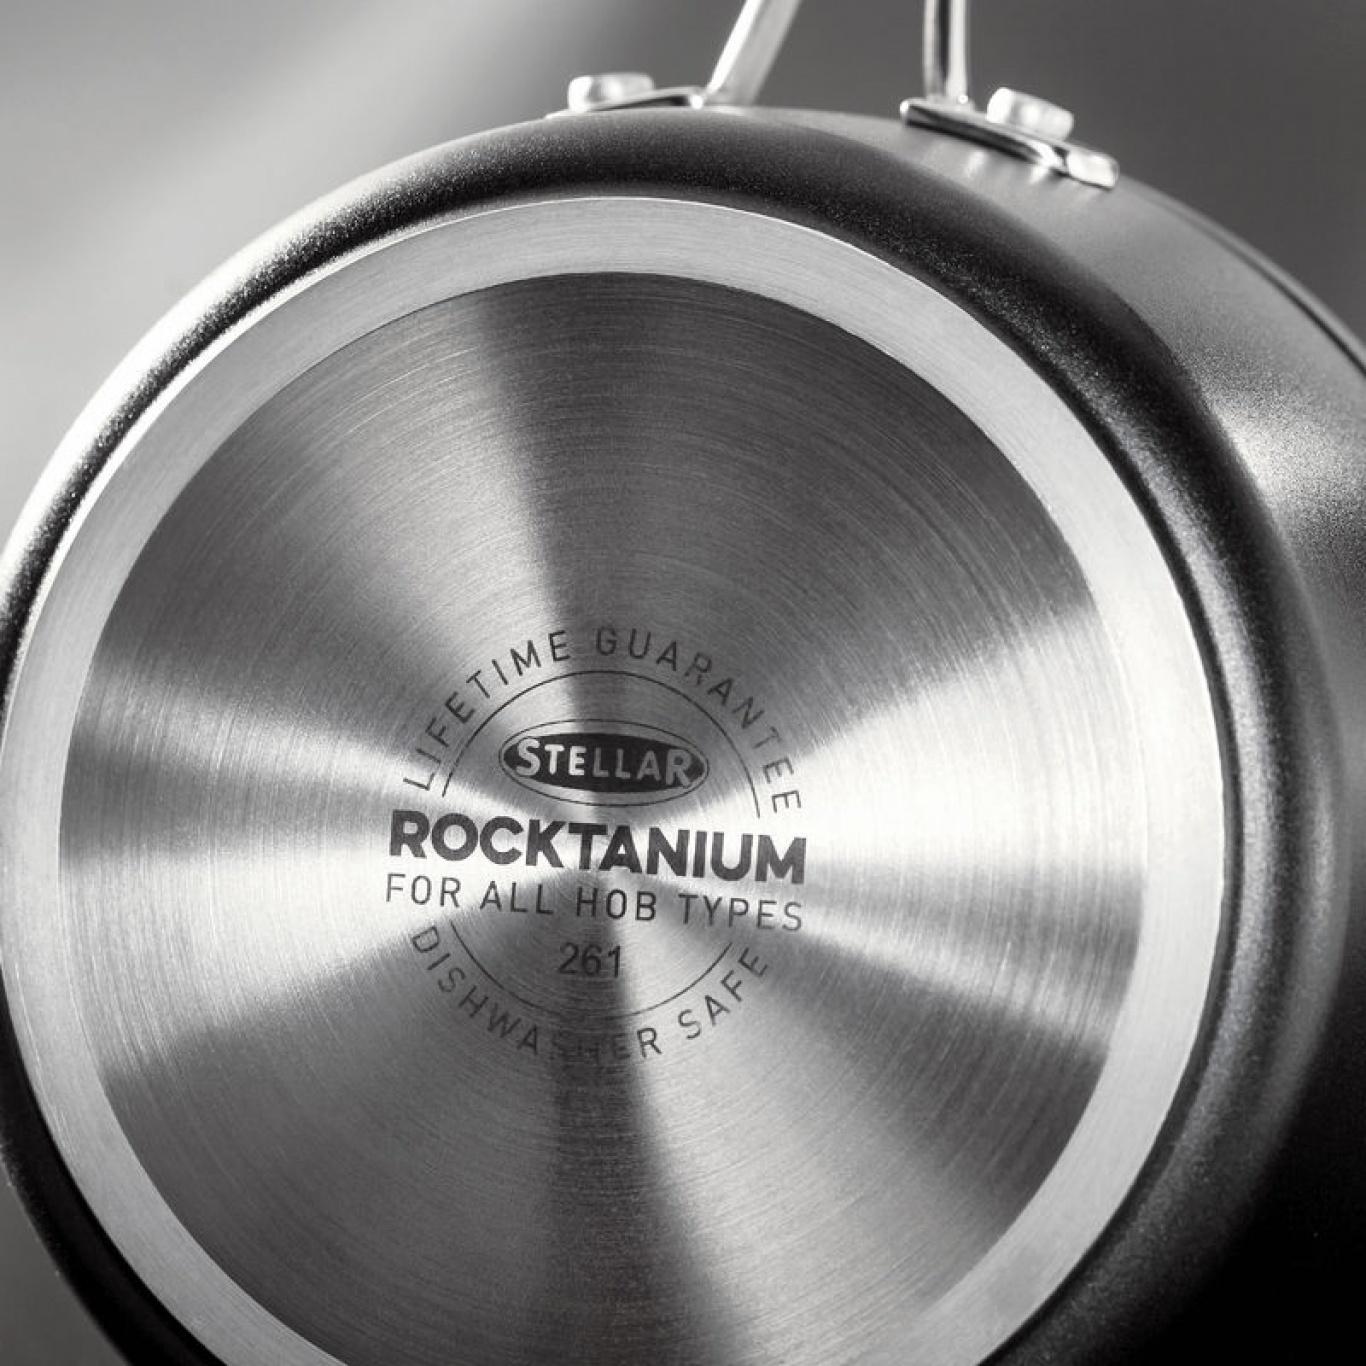 Stellar Rocktanium 18cm Saucepan